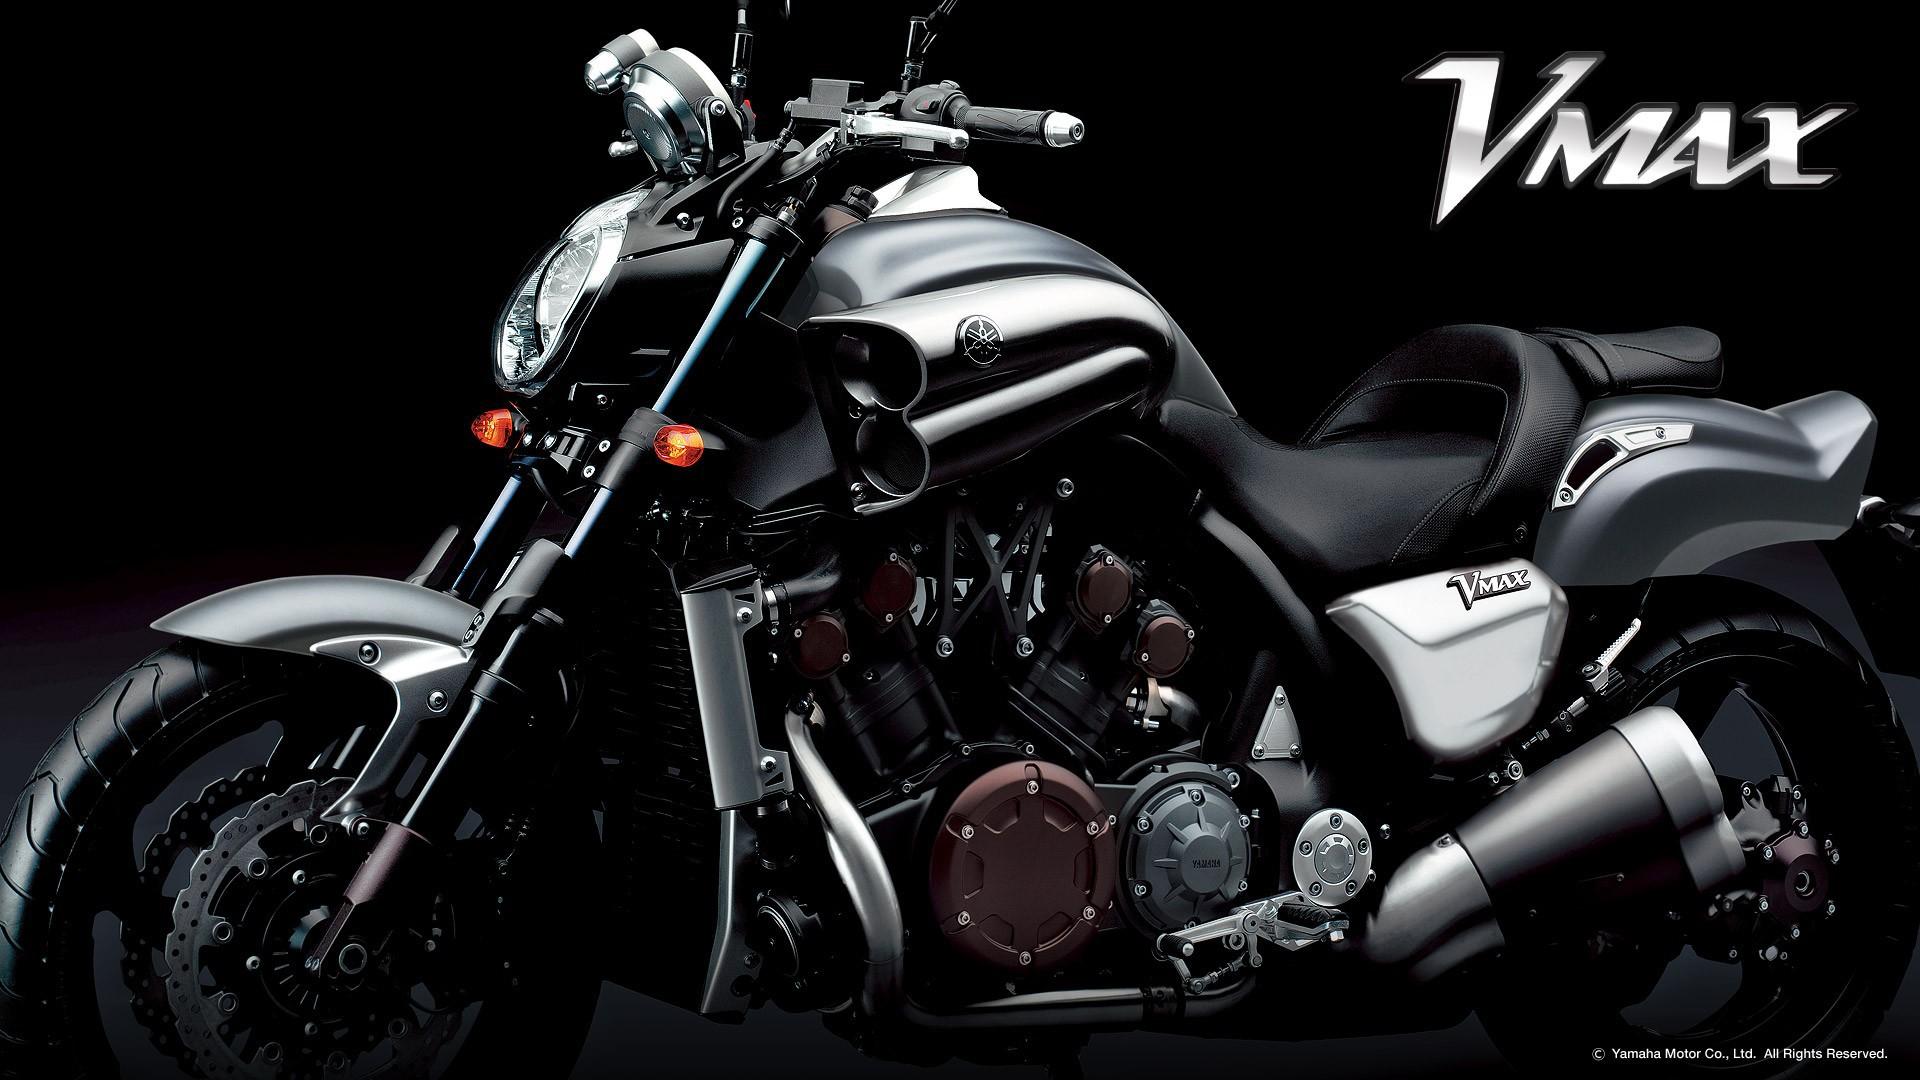 Yamaha V Мах (Ямаха В Макс) — обзор культового мотоцикла